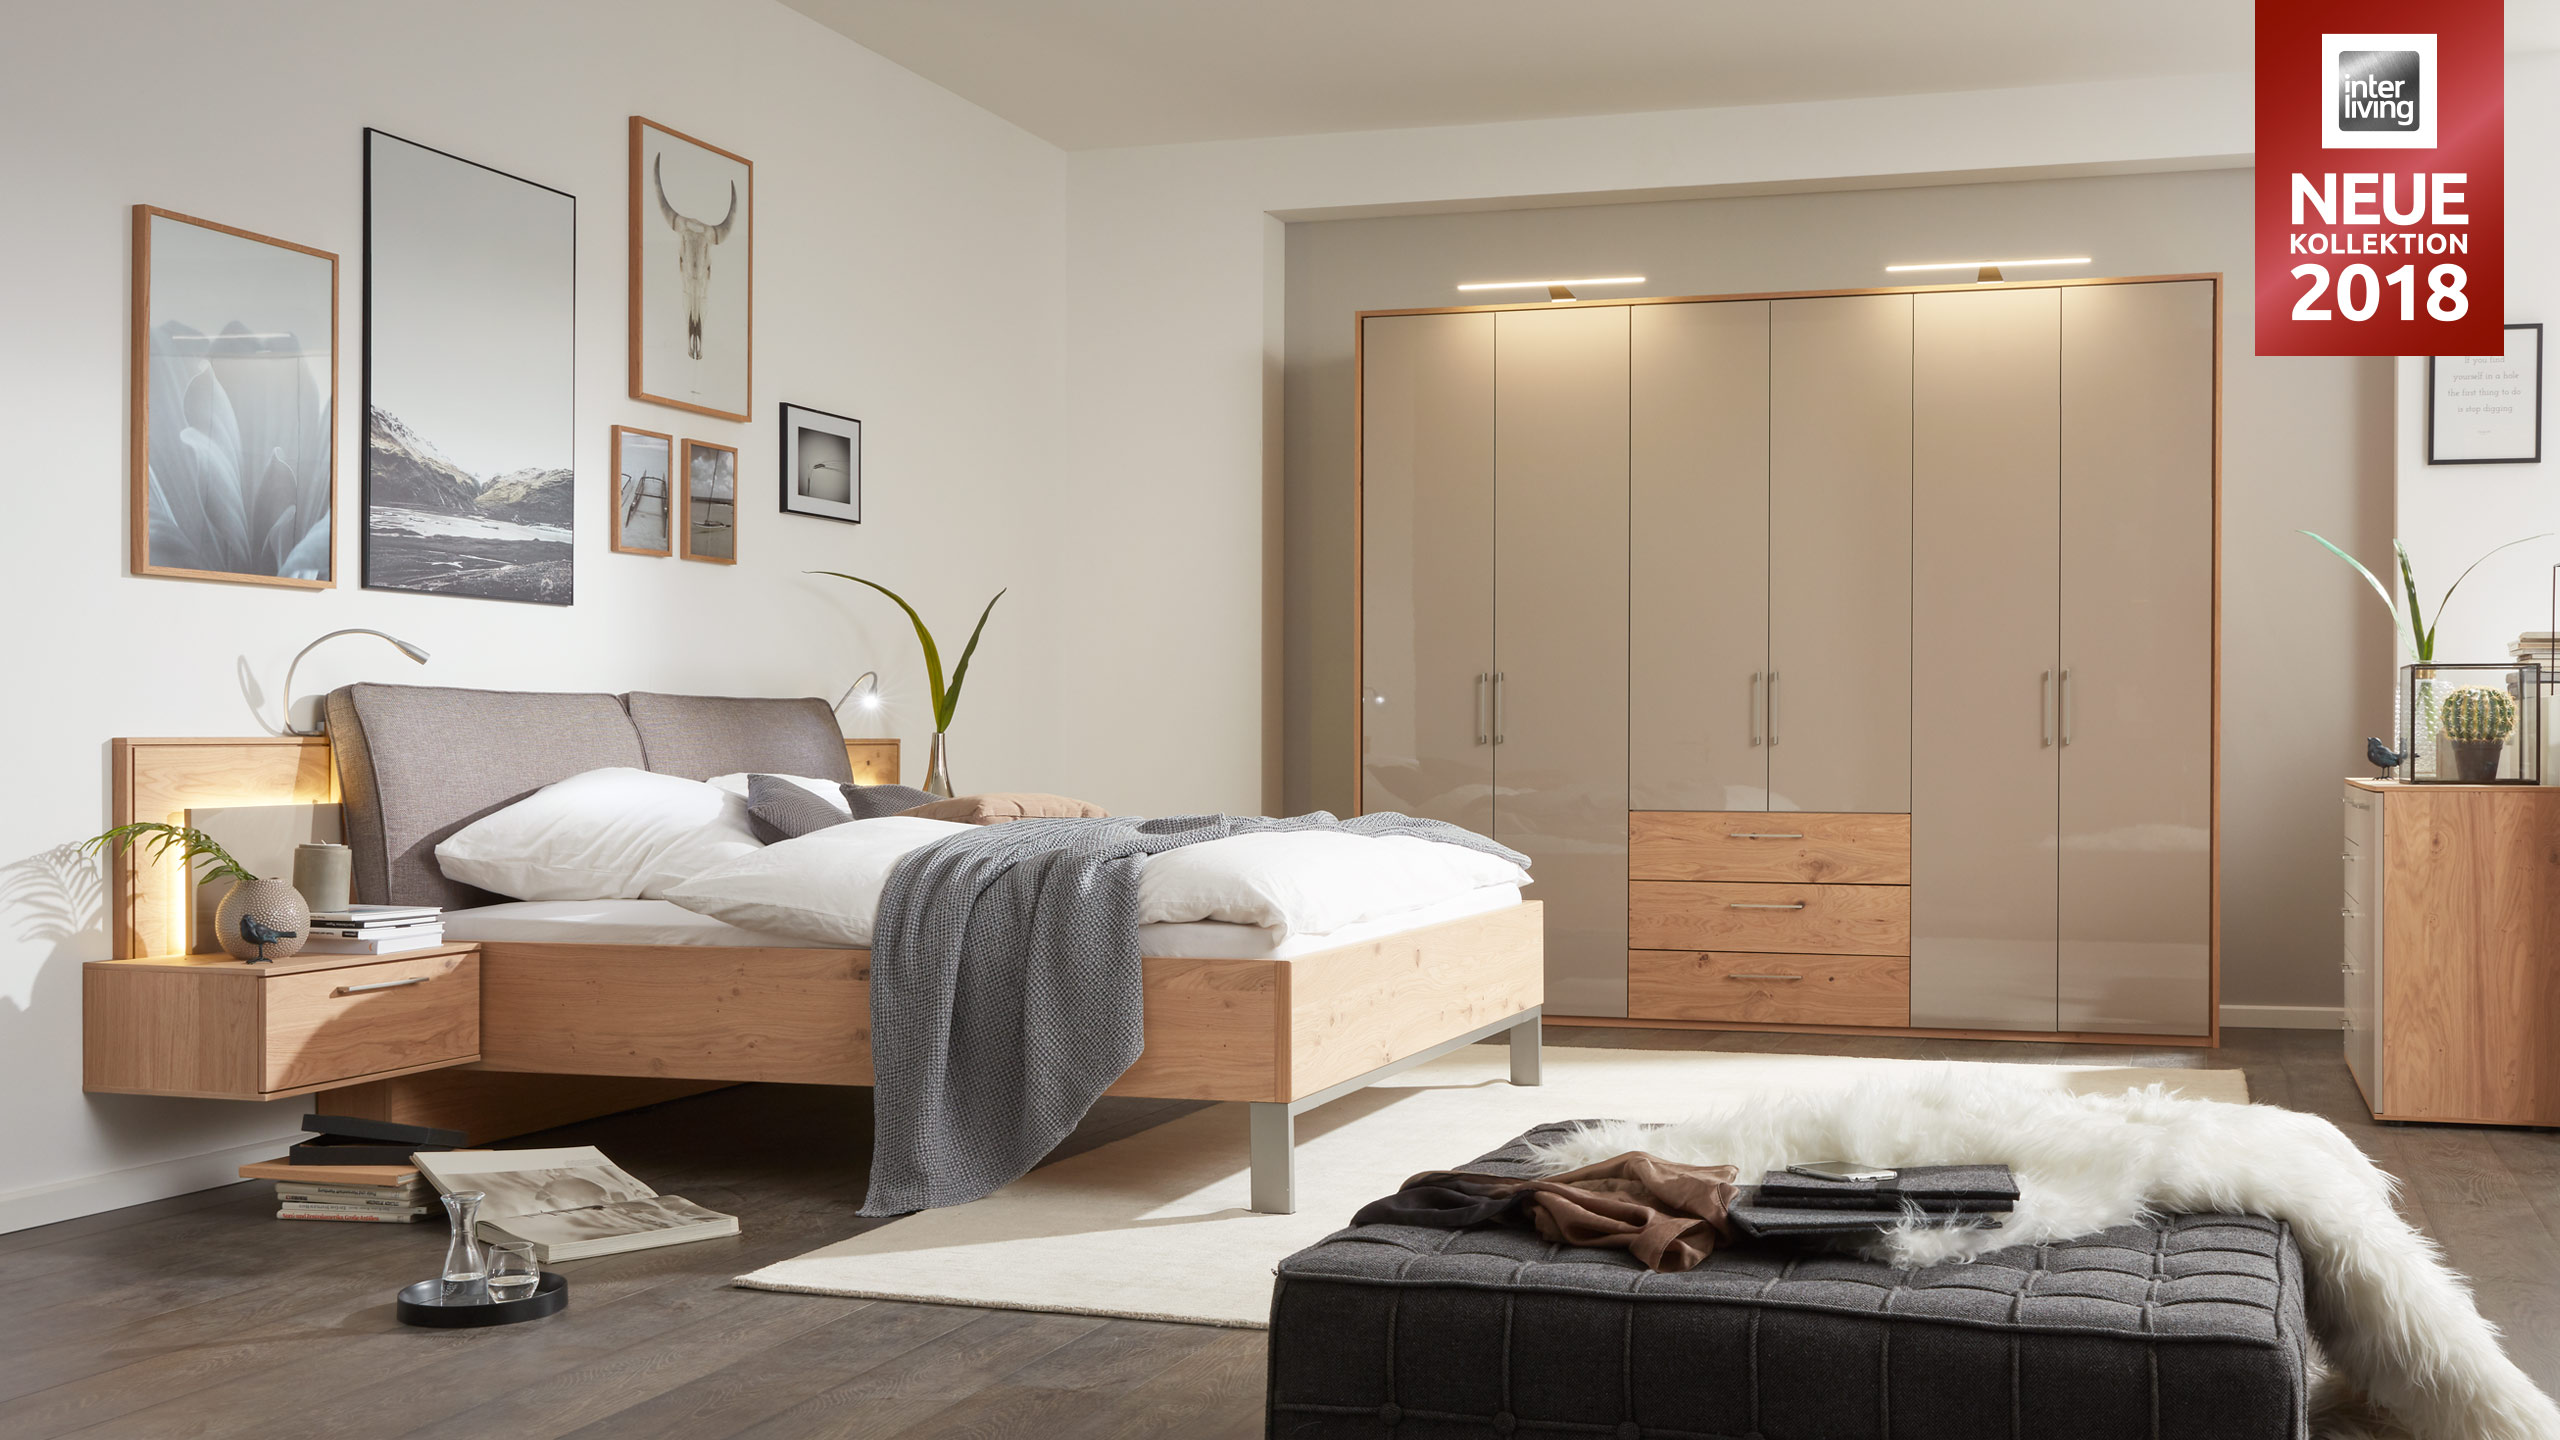 schlafzimmer archive interliving m bel f r mich gemacht. Black Bedroom Furniture Sets. Home Design Ideas